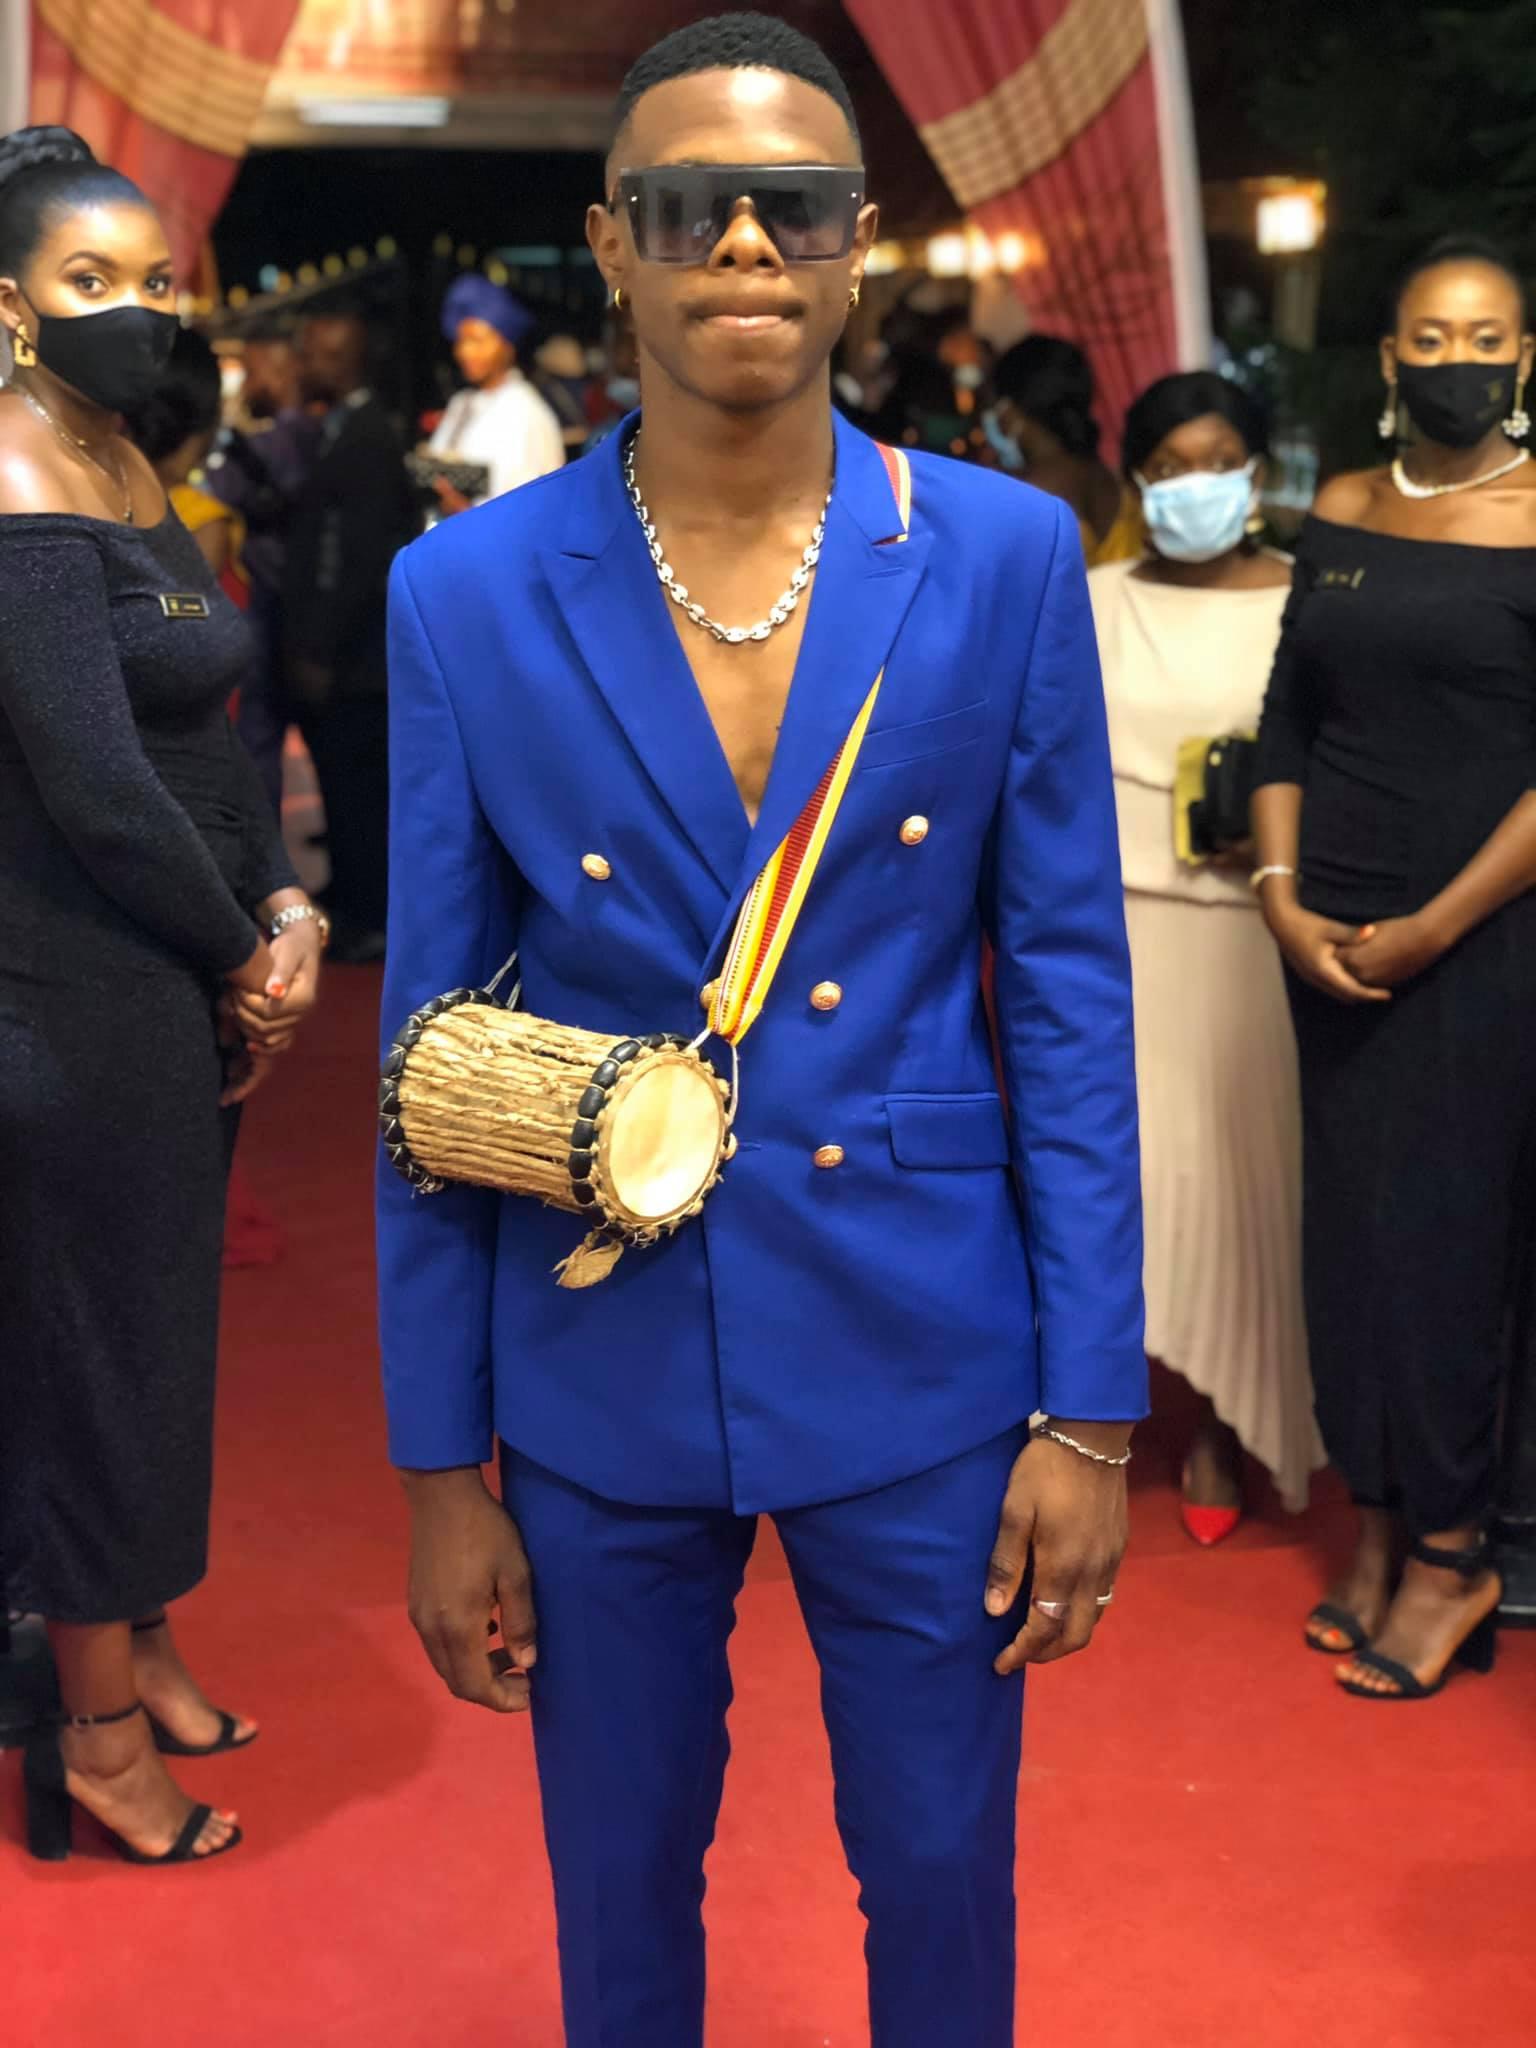 Happy D'Effoulan (Cameroonian Artist)